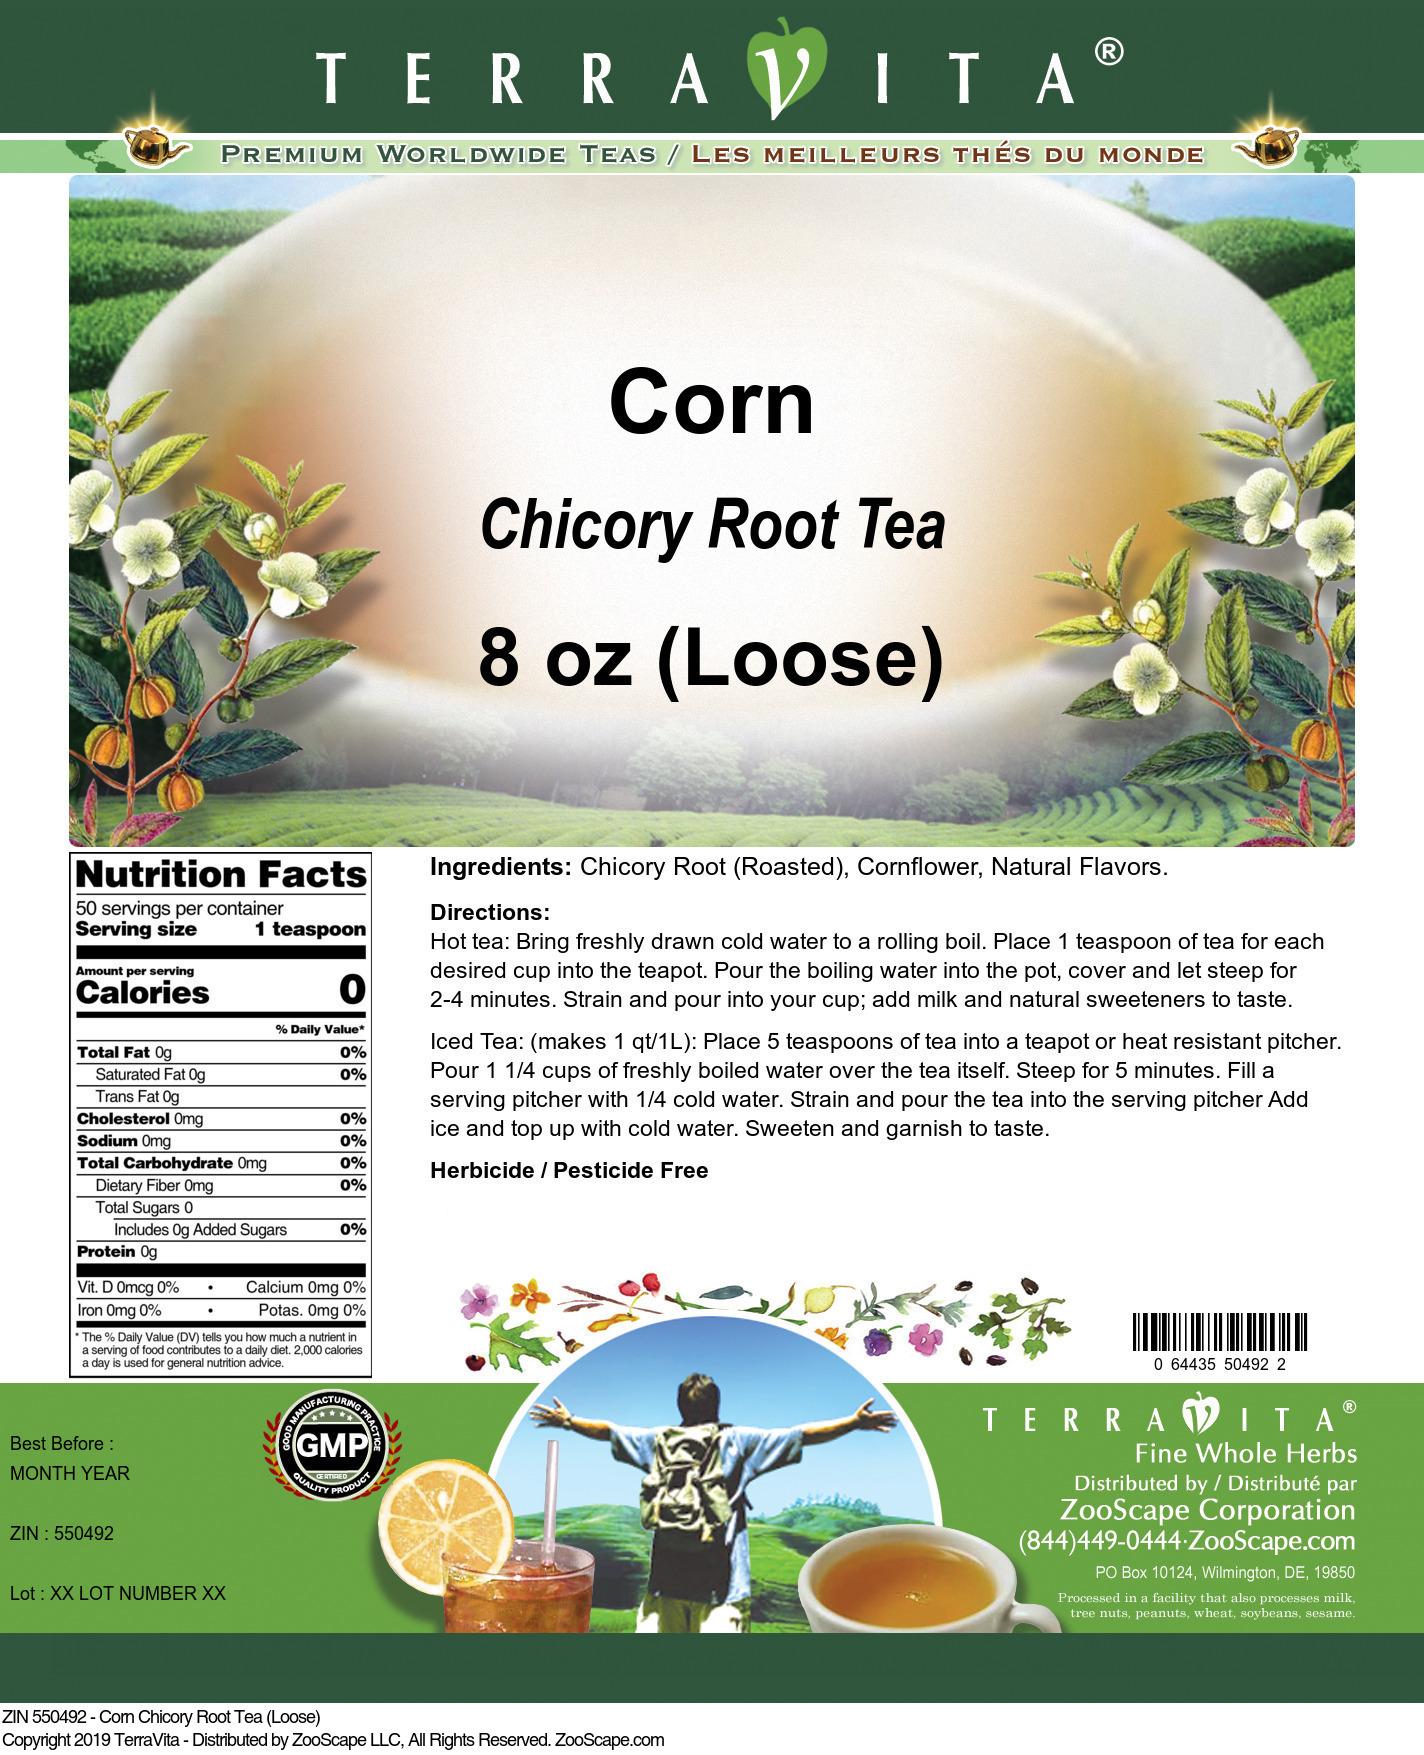 Corn Chicory Root Tea (Loose)